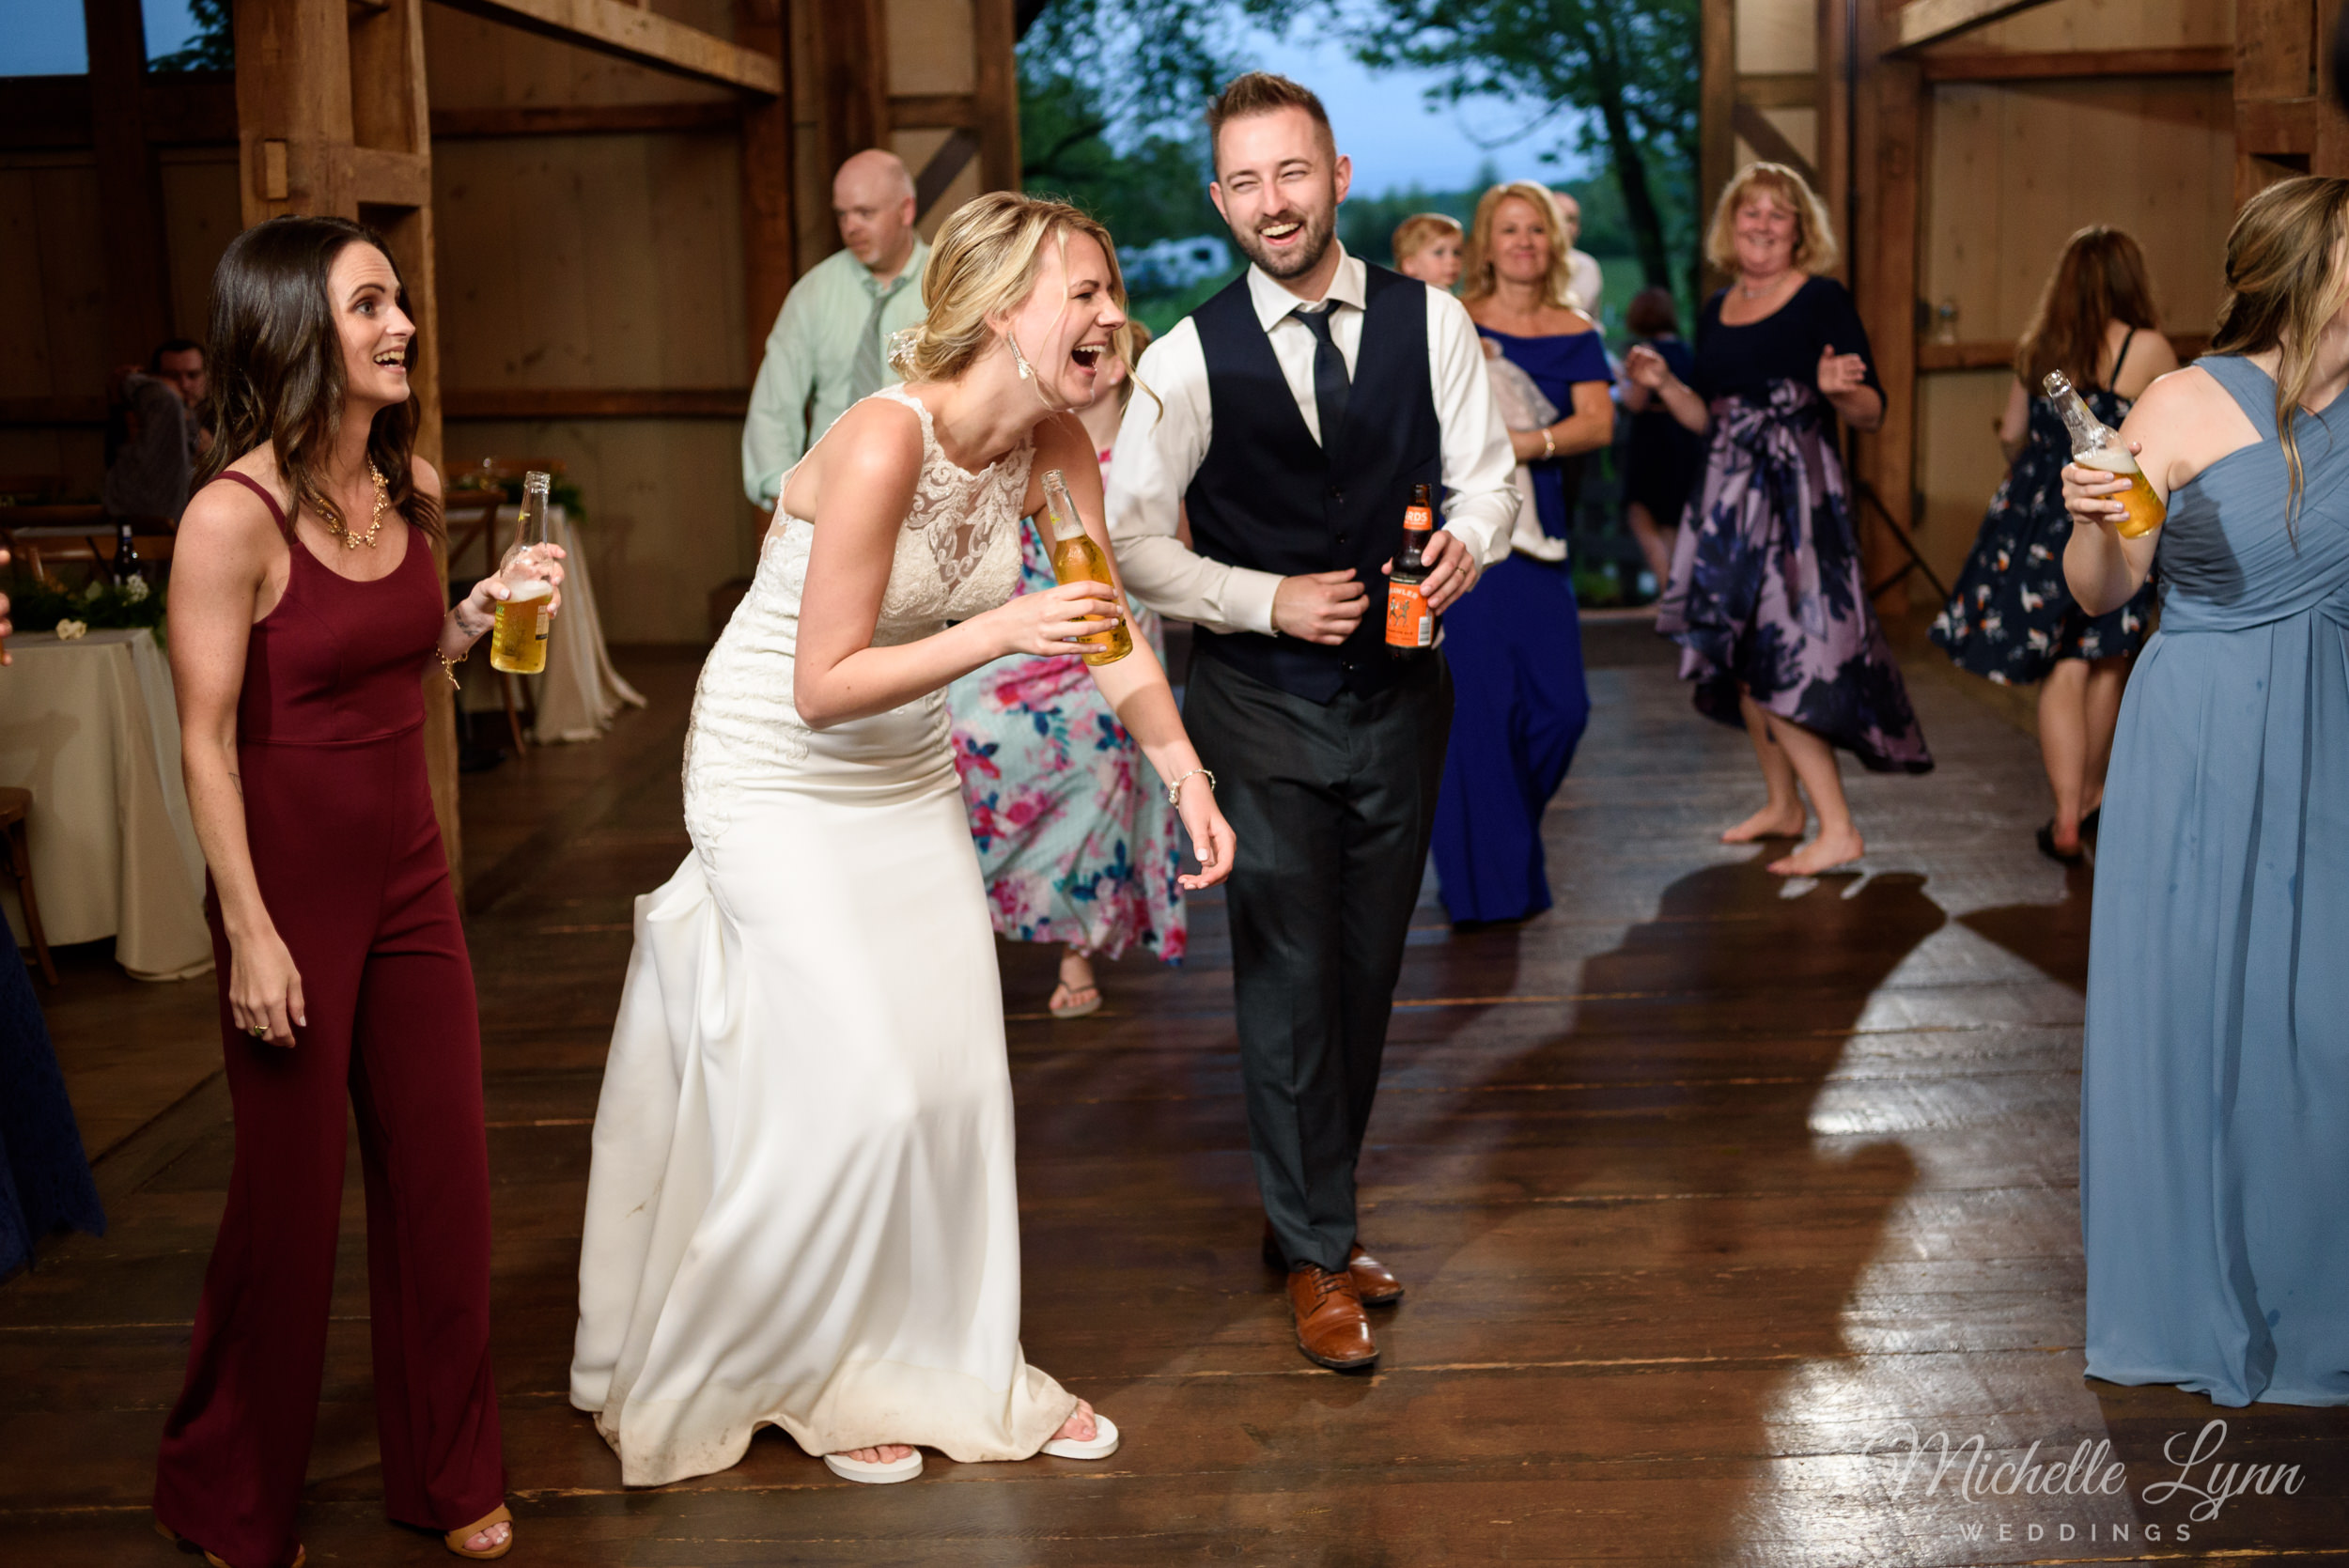 mlw-the-farm-bakery-and-events-wedding-photos-79.jpg